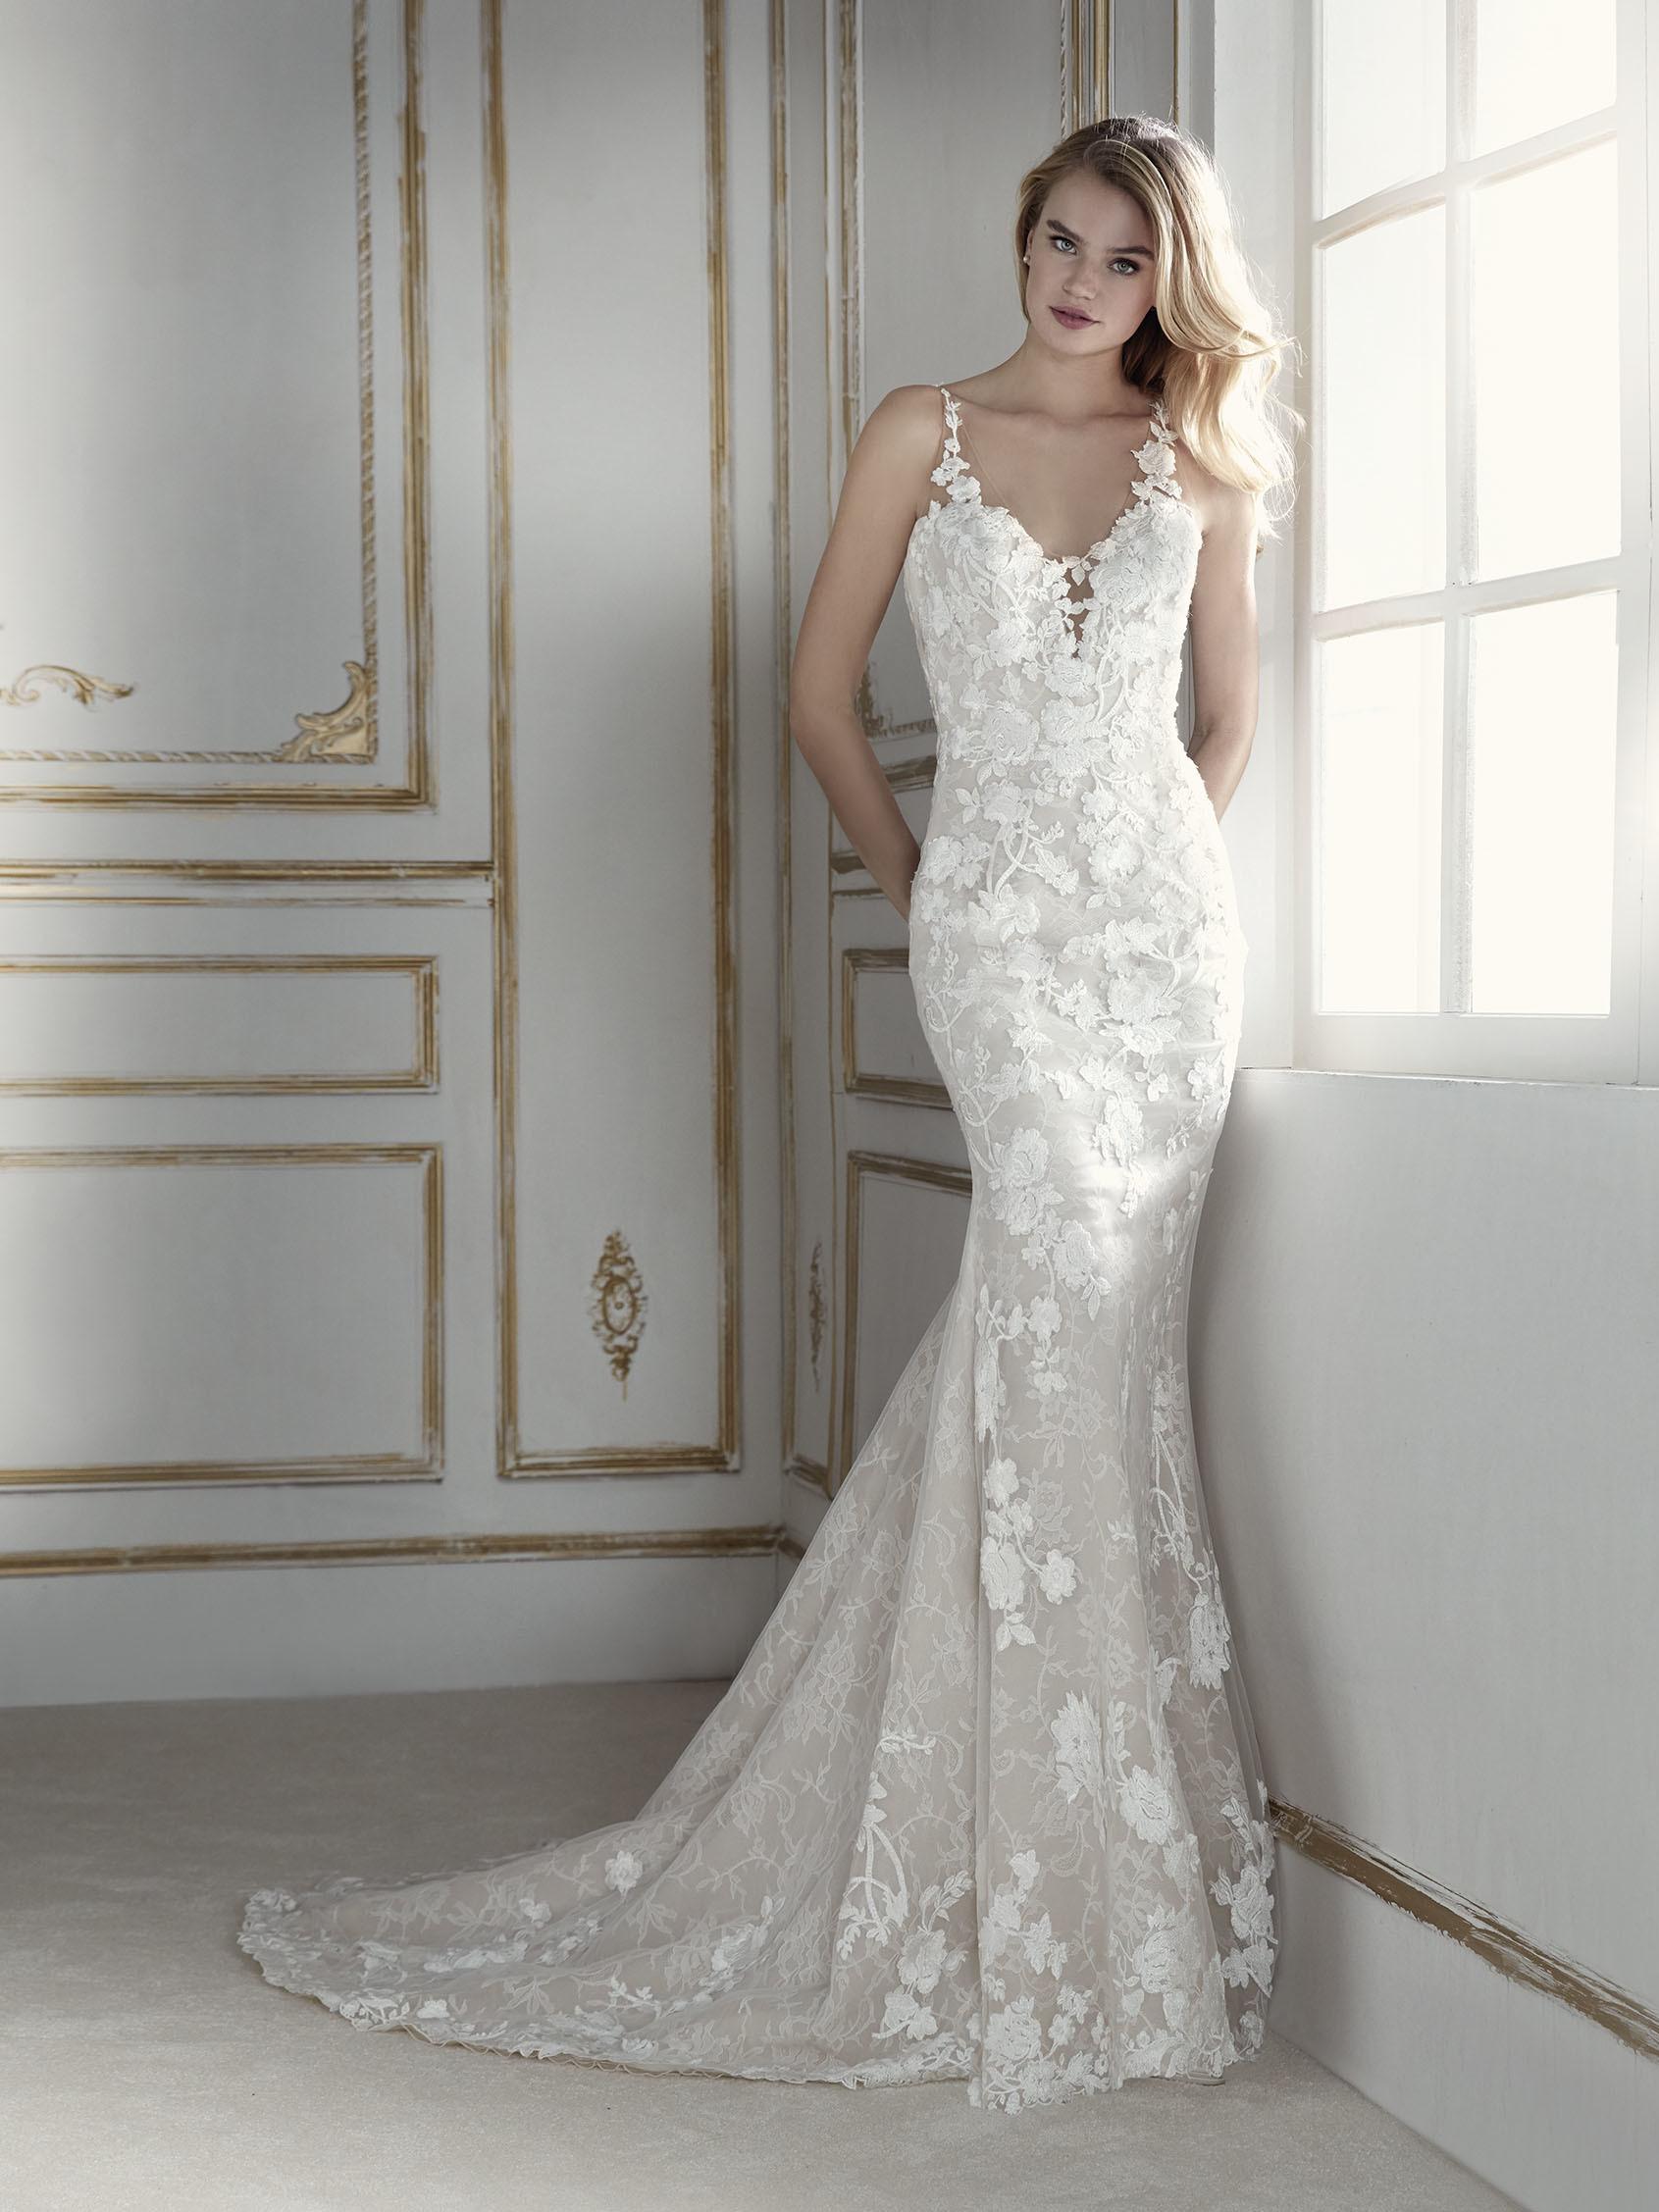 40f54300e293 The fabric is the star of this romantic mermaid wedding dress. A  figure-hugging dress that styliz.